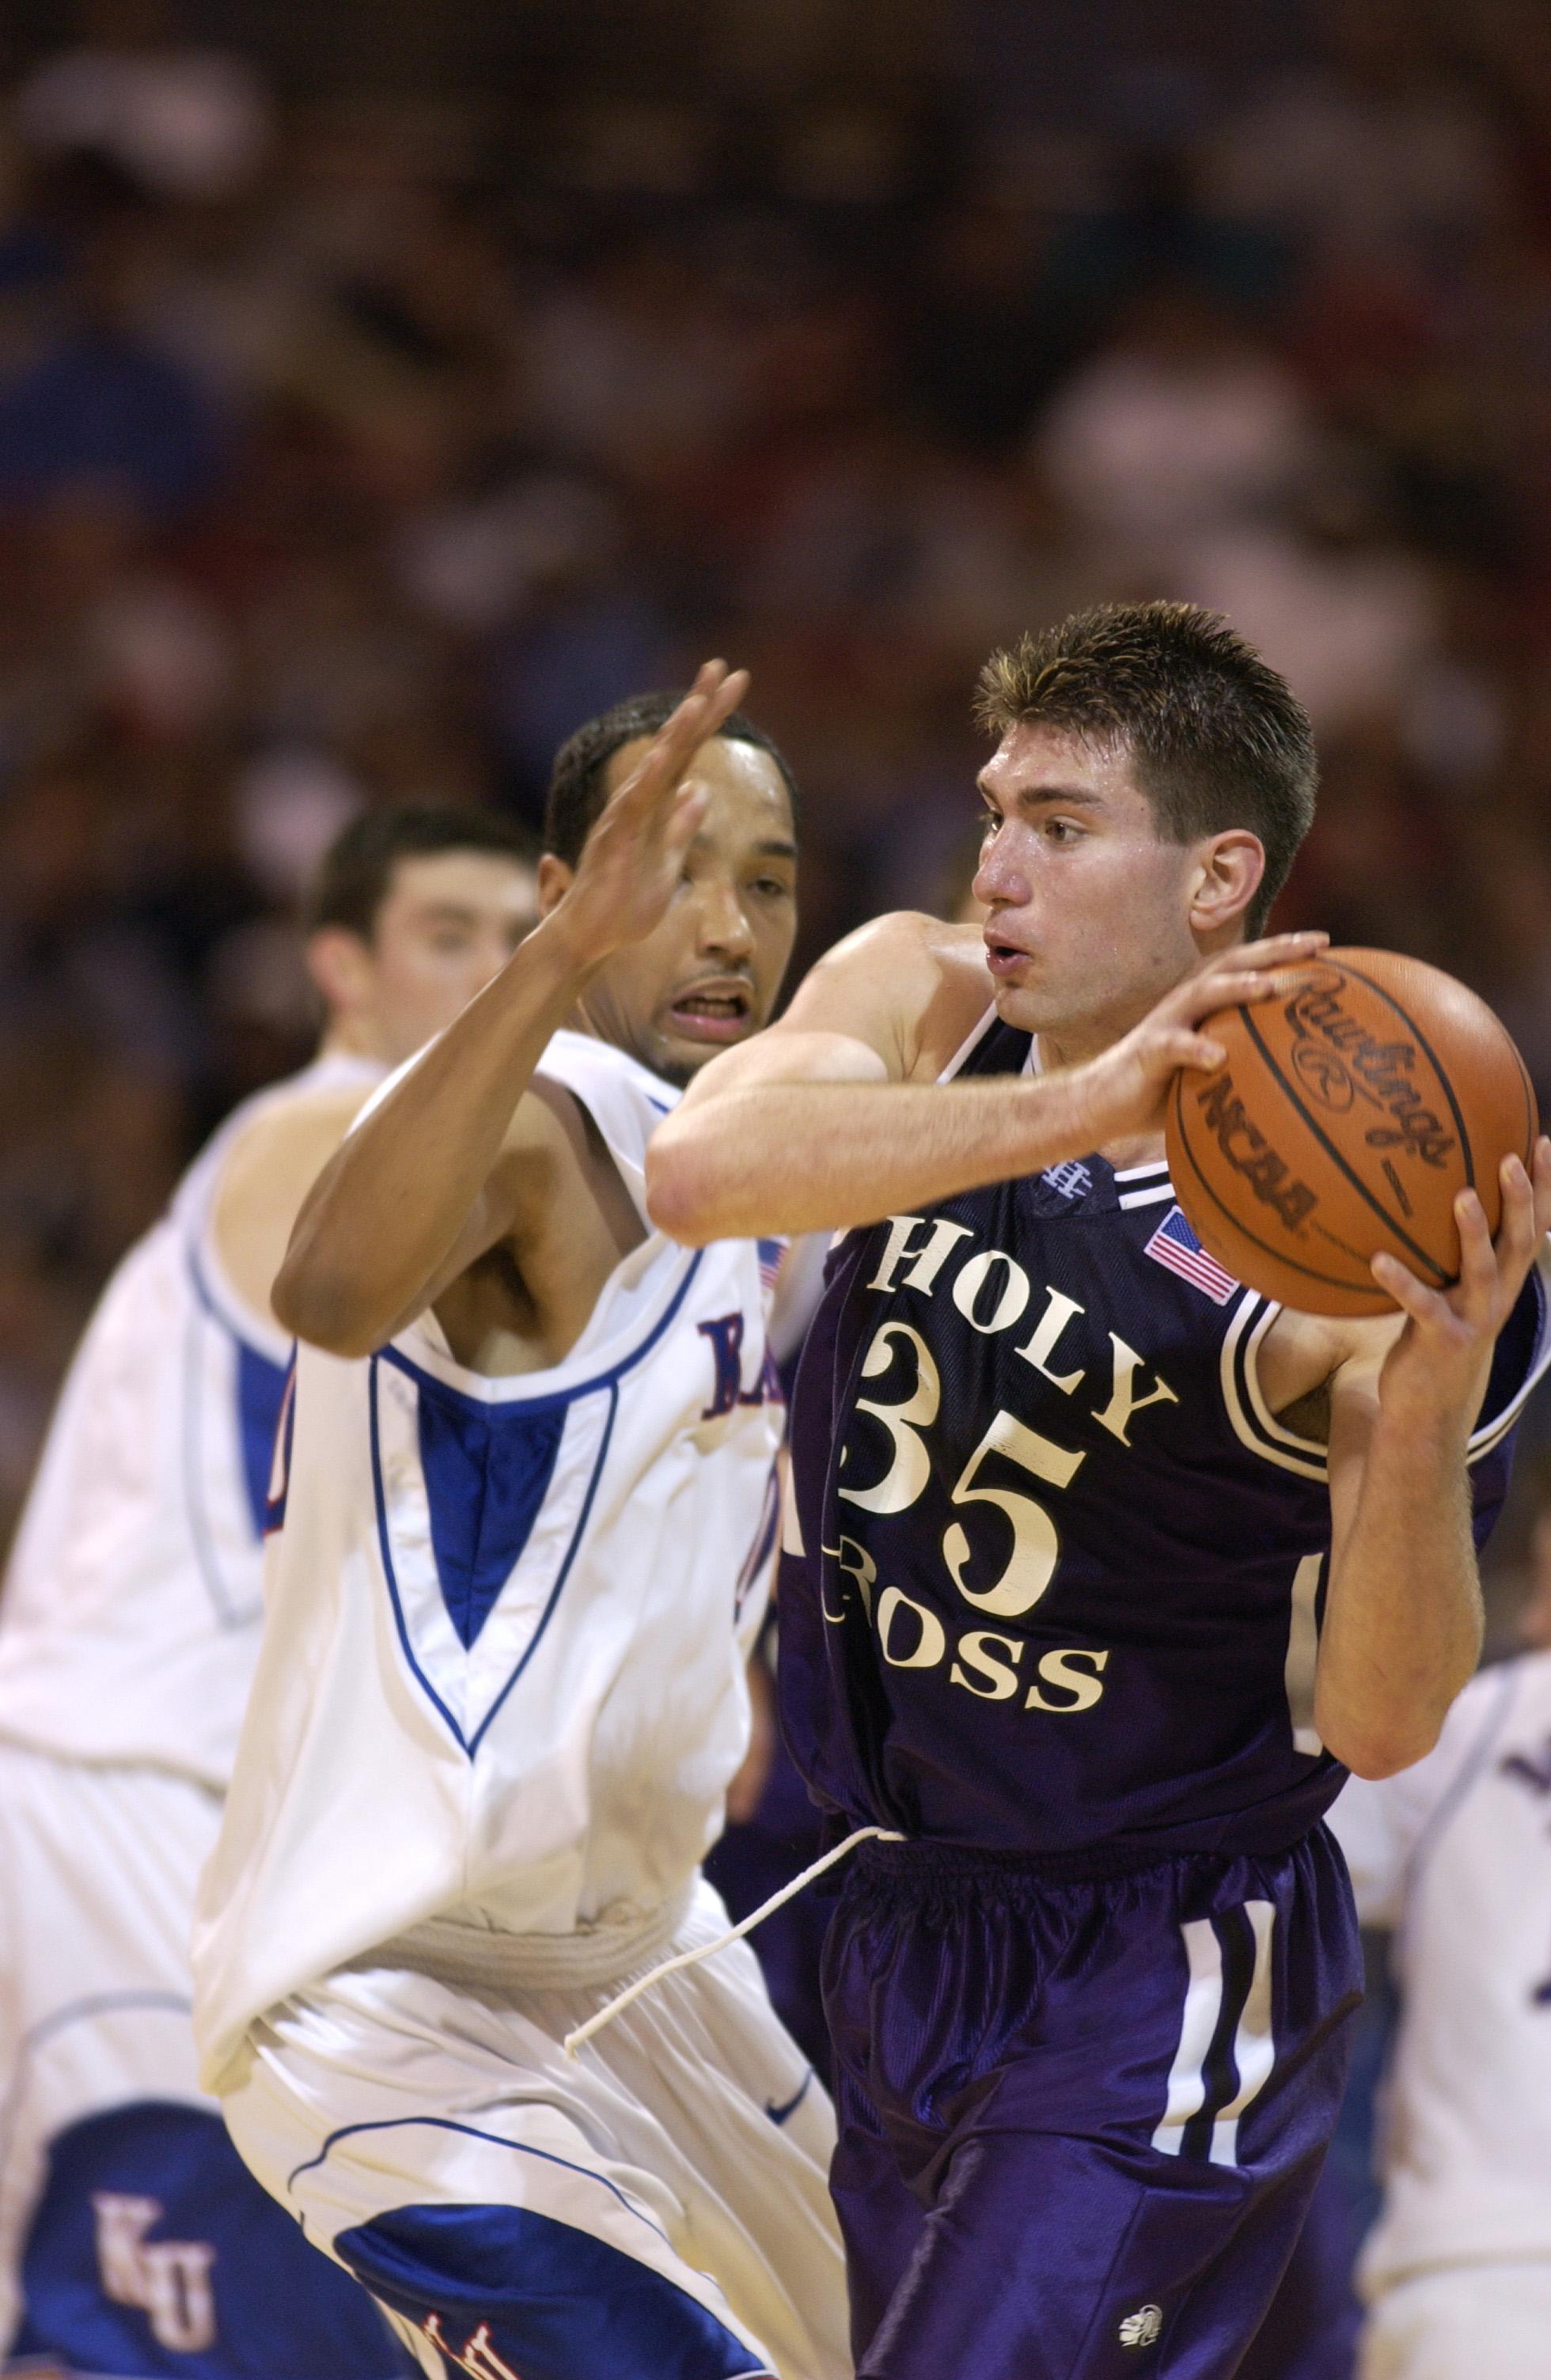 Tim Szatko scored 13 points against Drew Gooden and Kansas in the 2002 NCAA Tournament